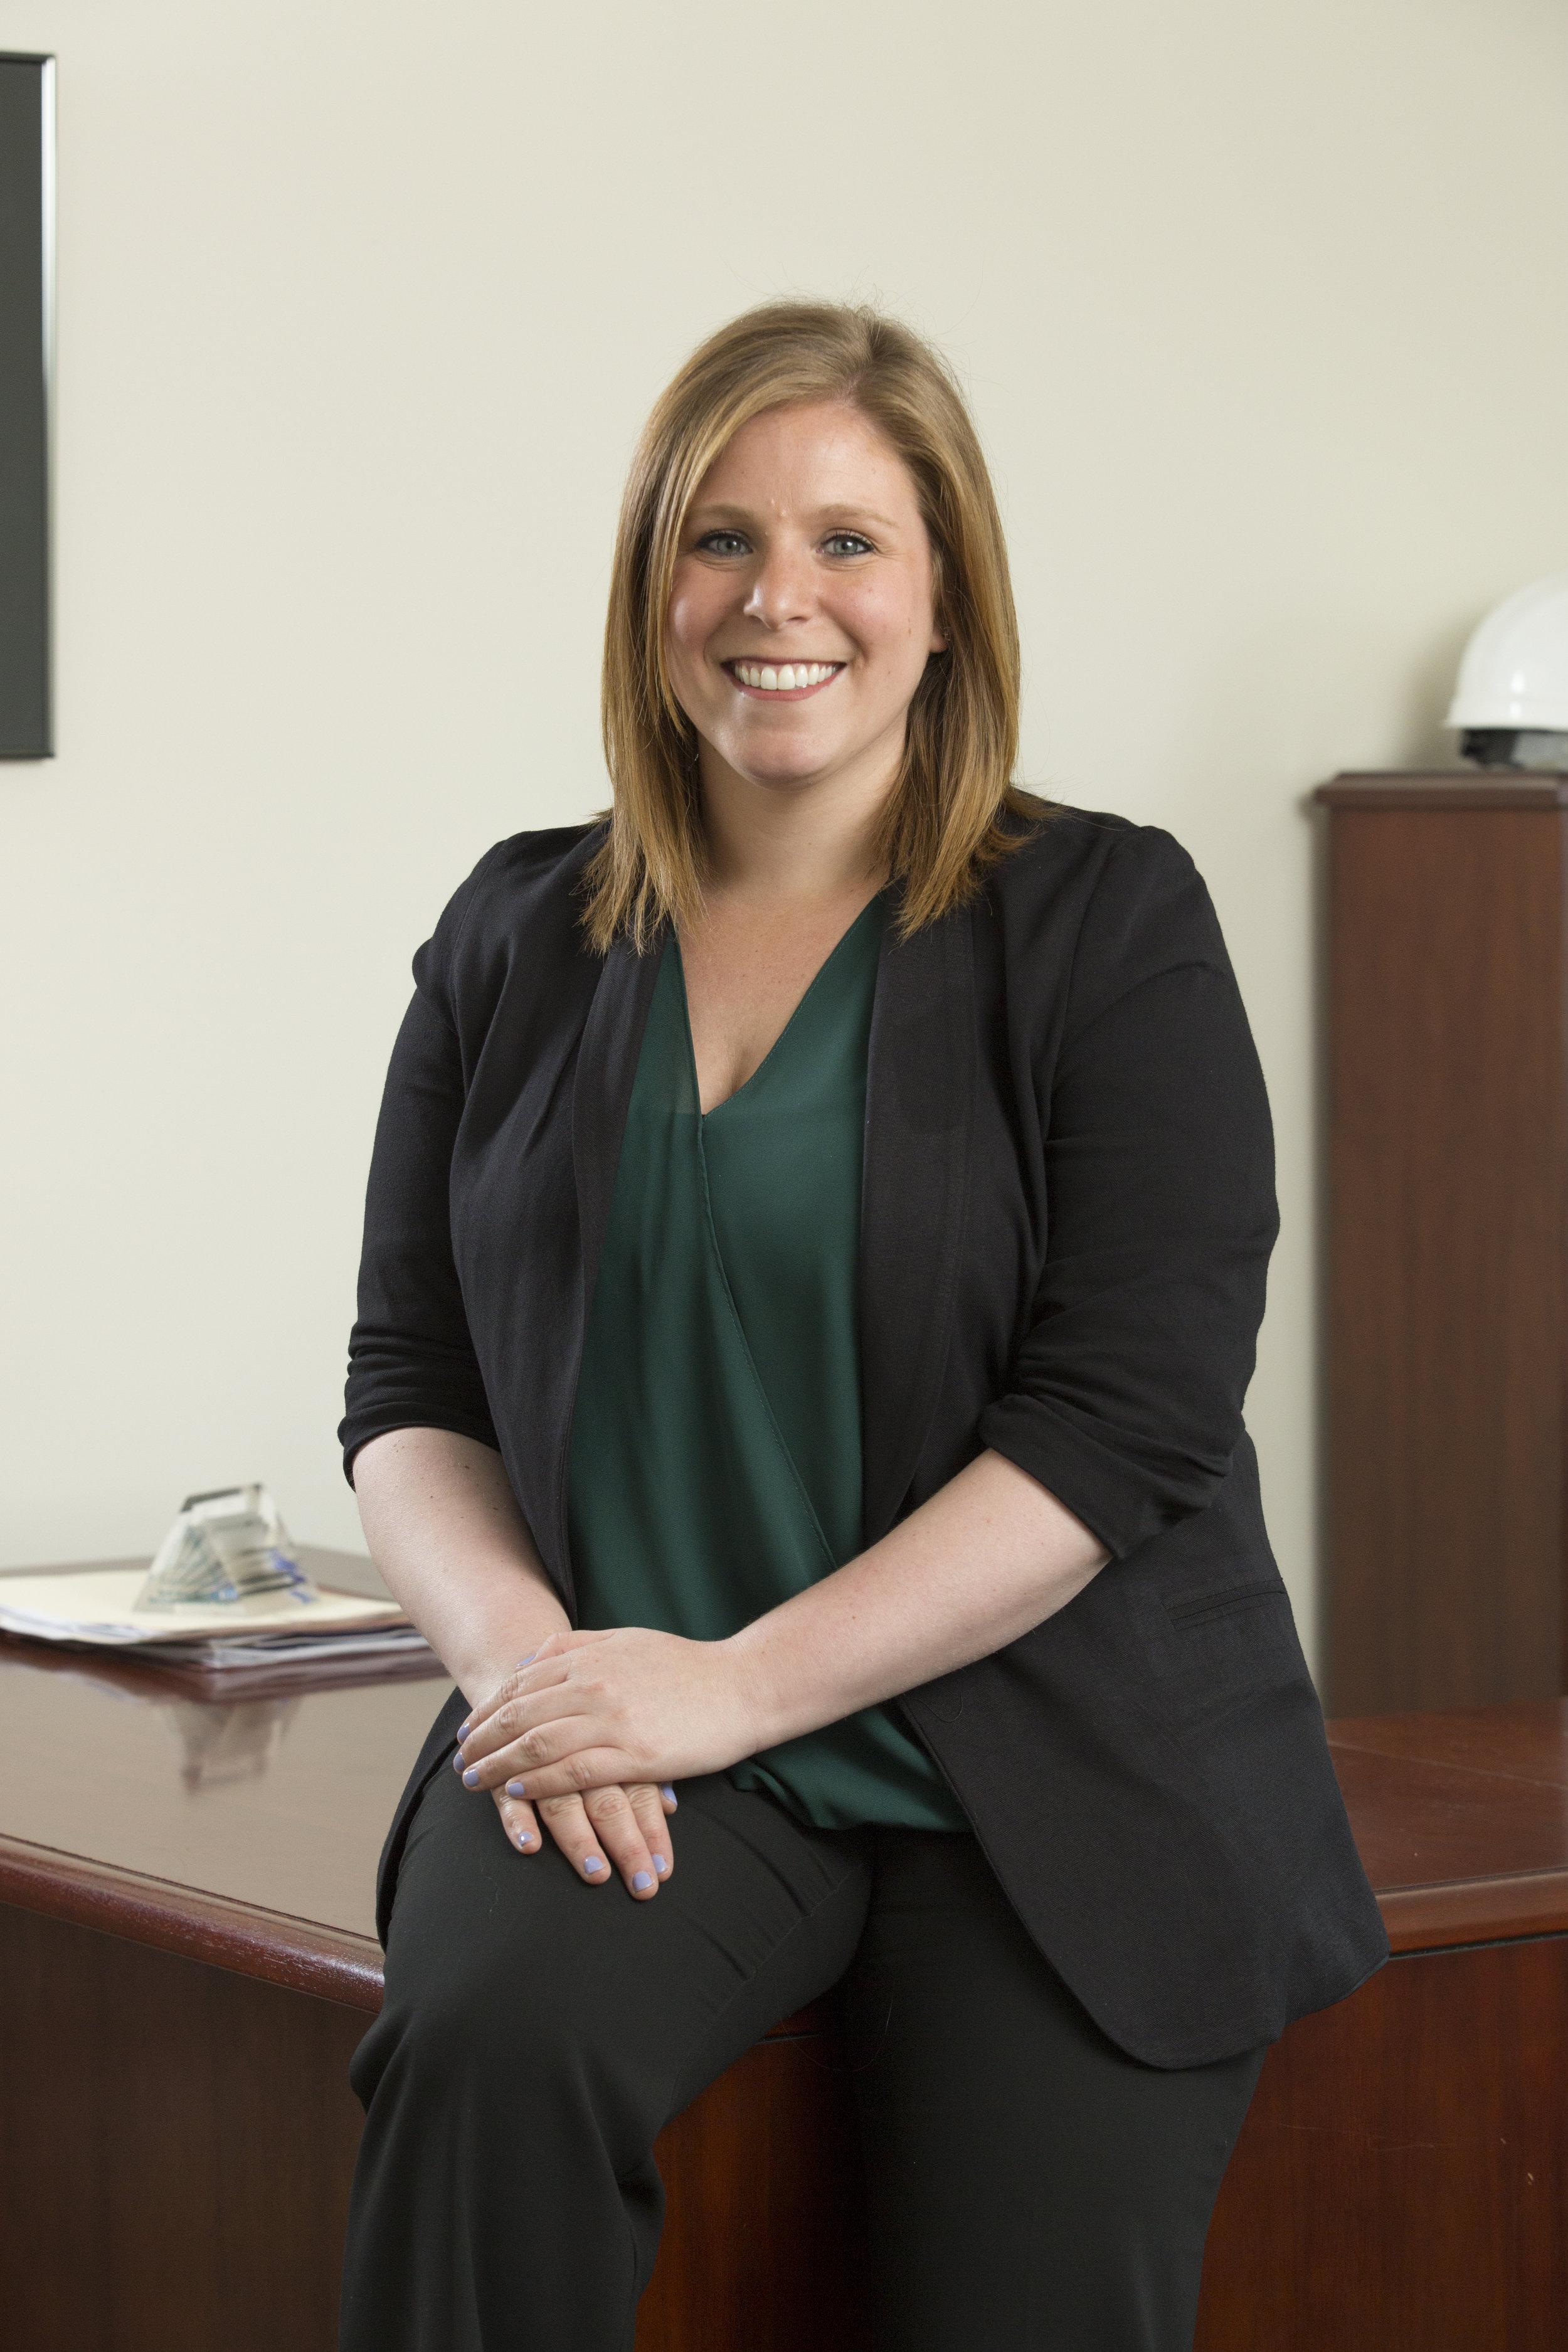 JAMI HORTON - Director of Marketing